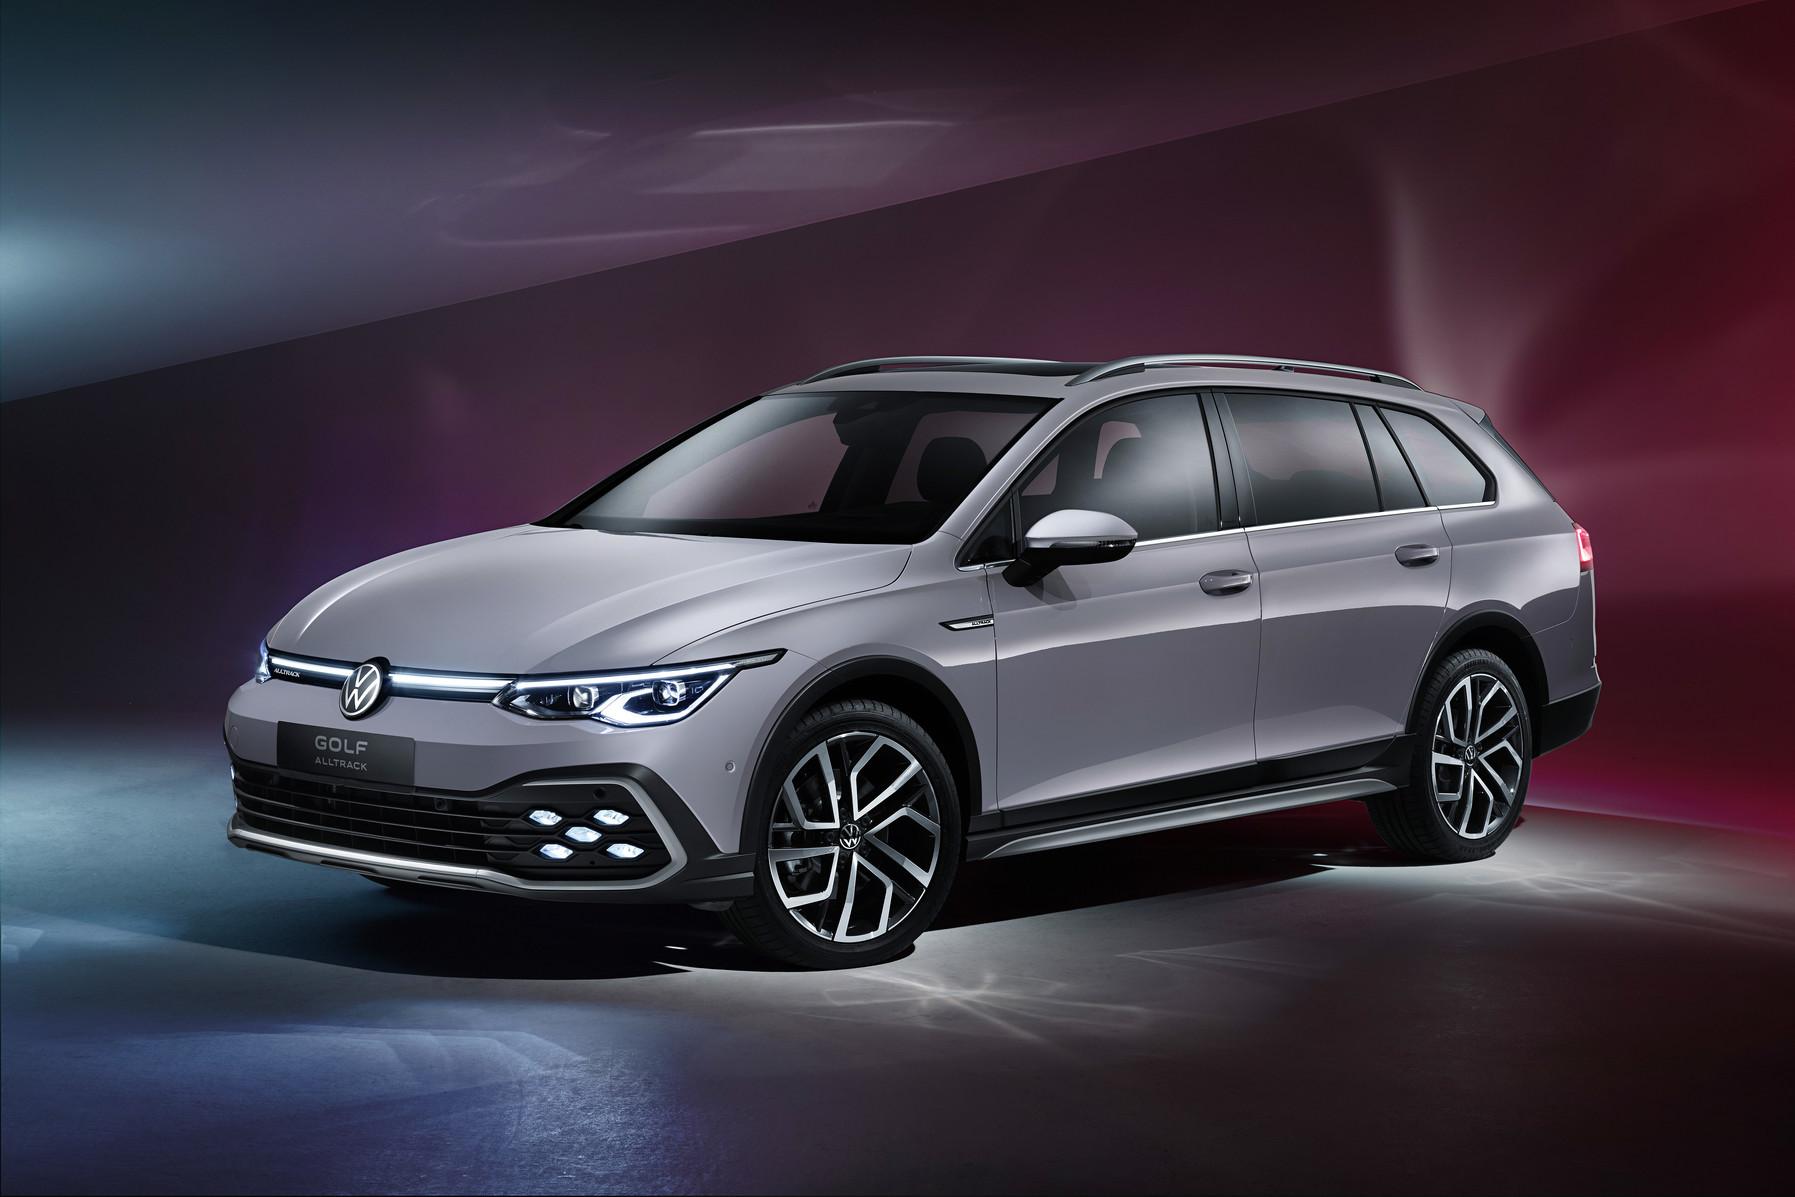 Nuova Volkswagen Golf Alltrack